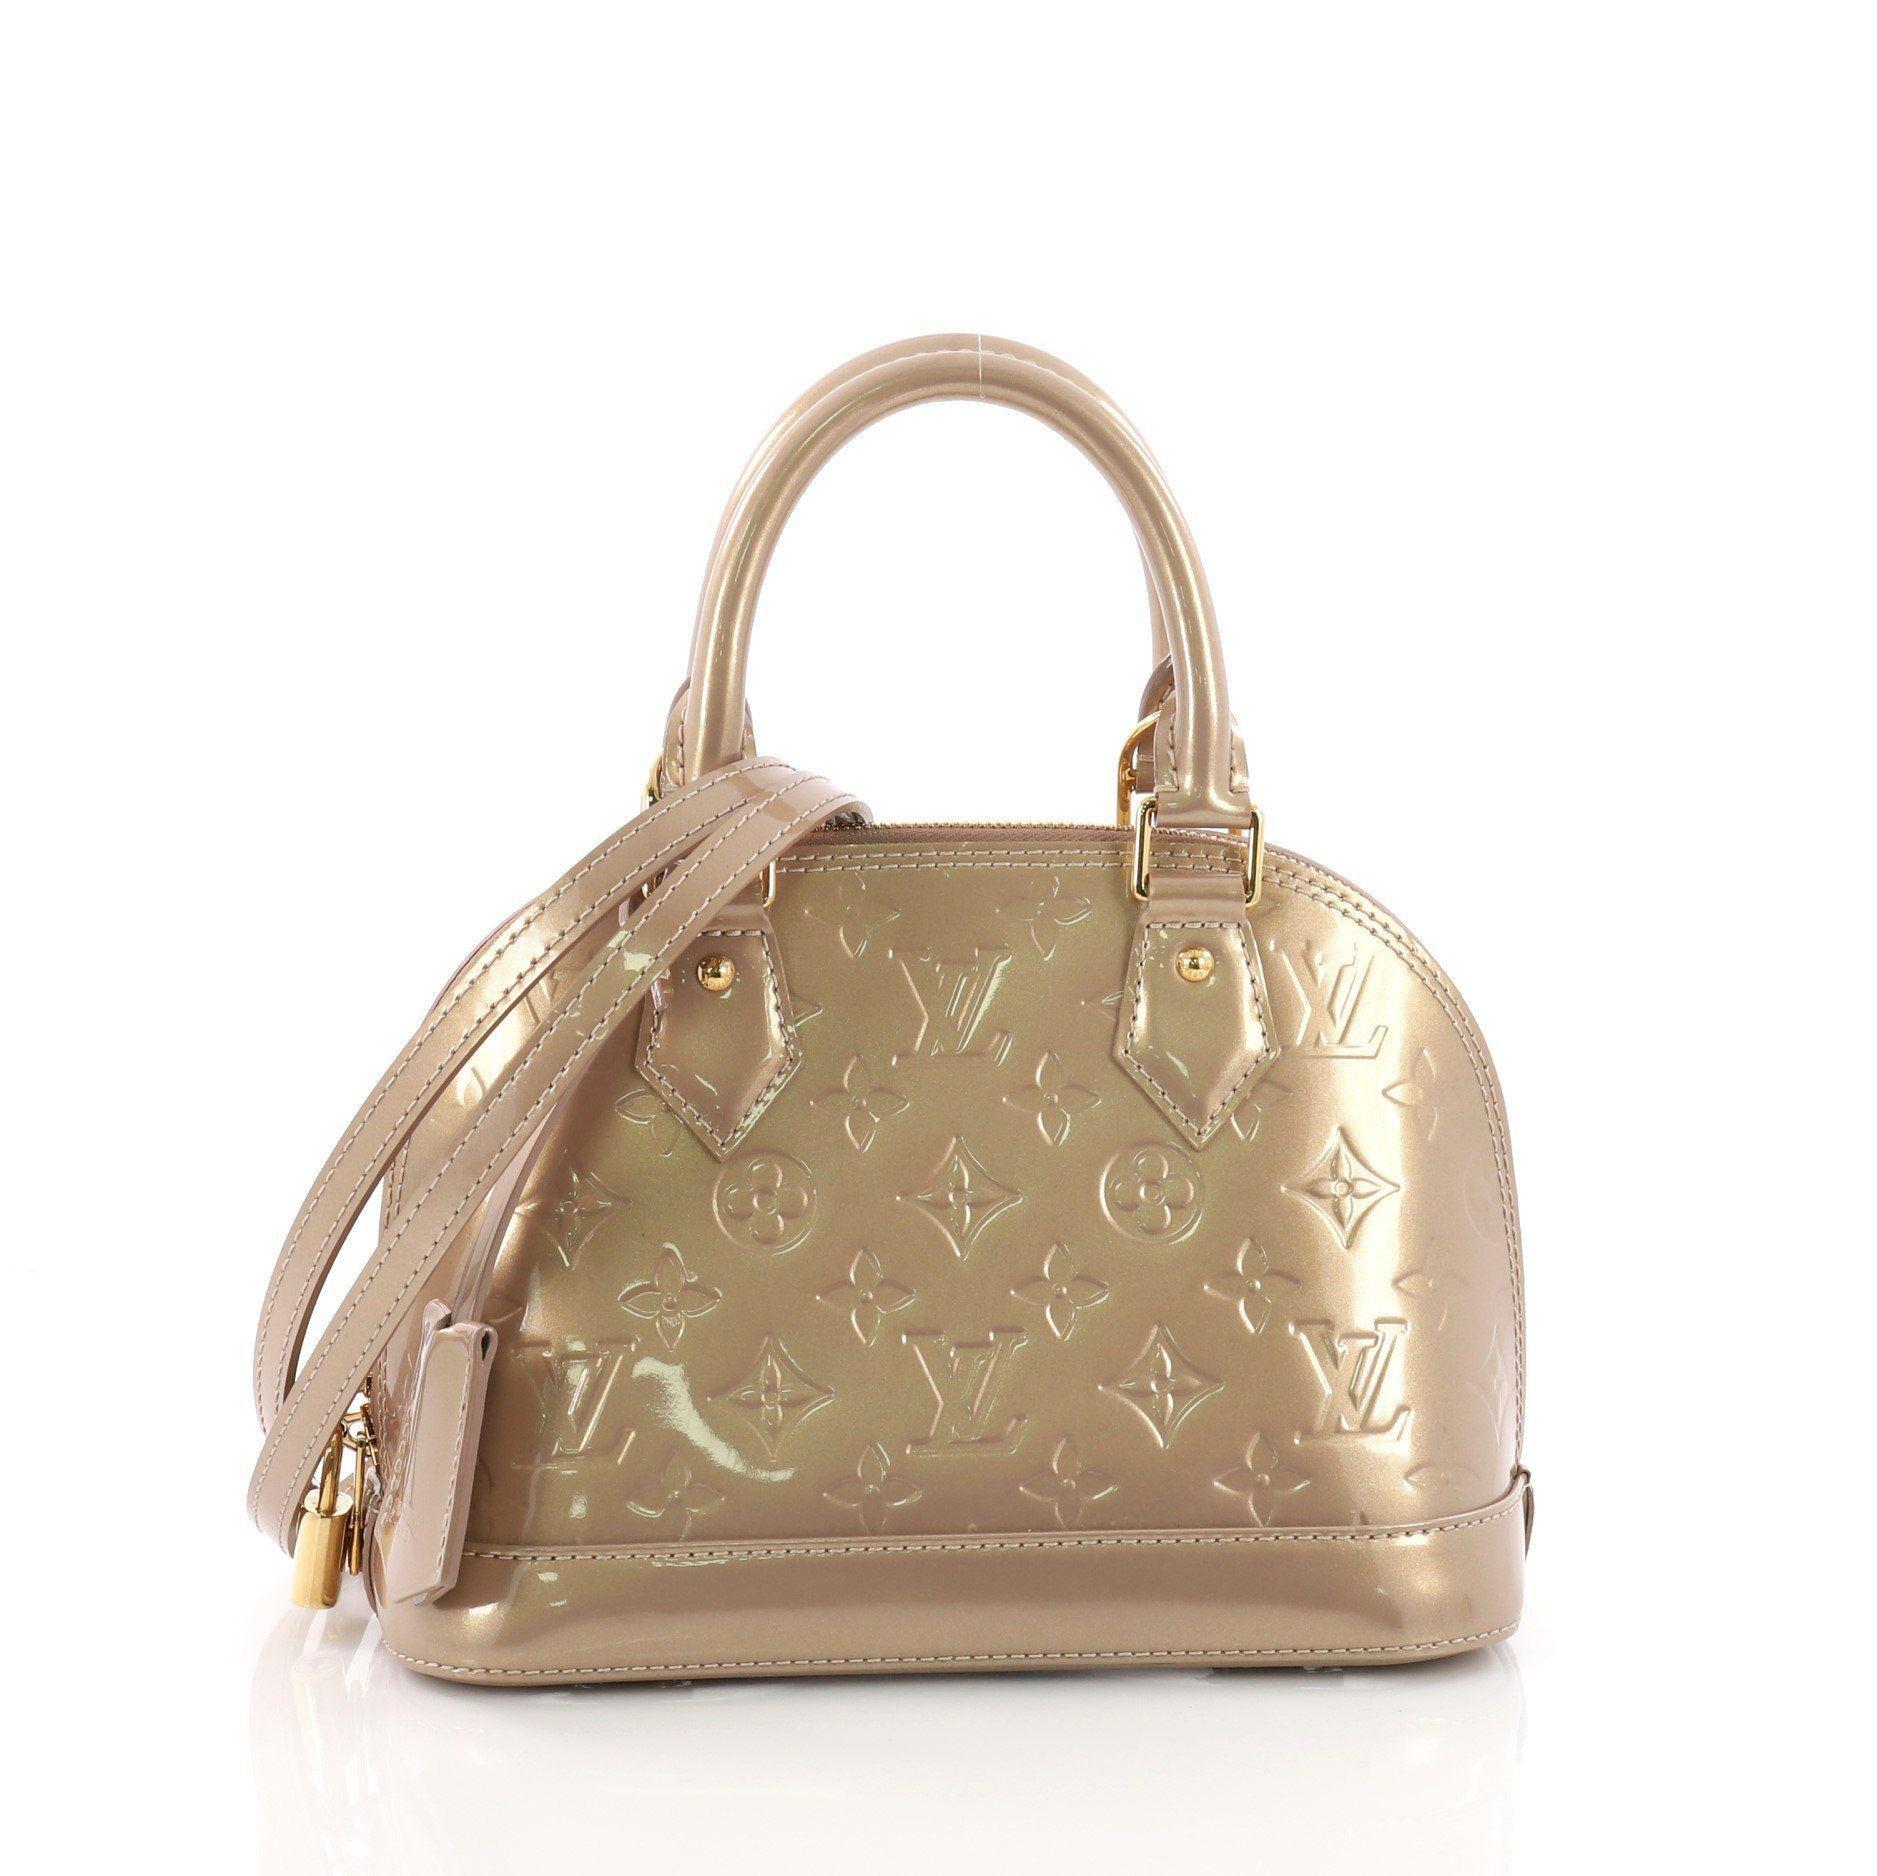 21e01b2badff Lyst - Louis Vuitton Pre Owned Alma Handbag Monogram Vernis Bb